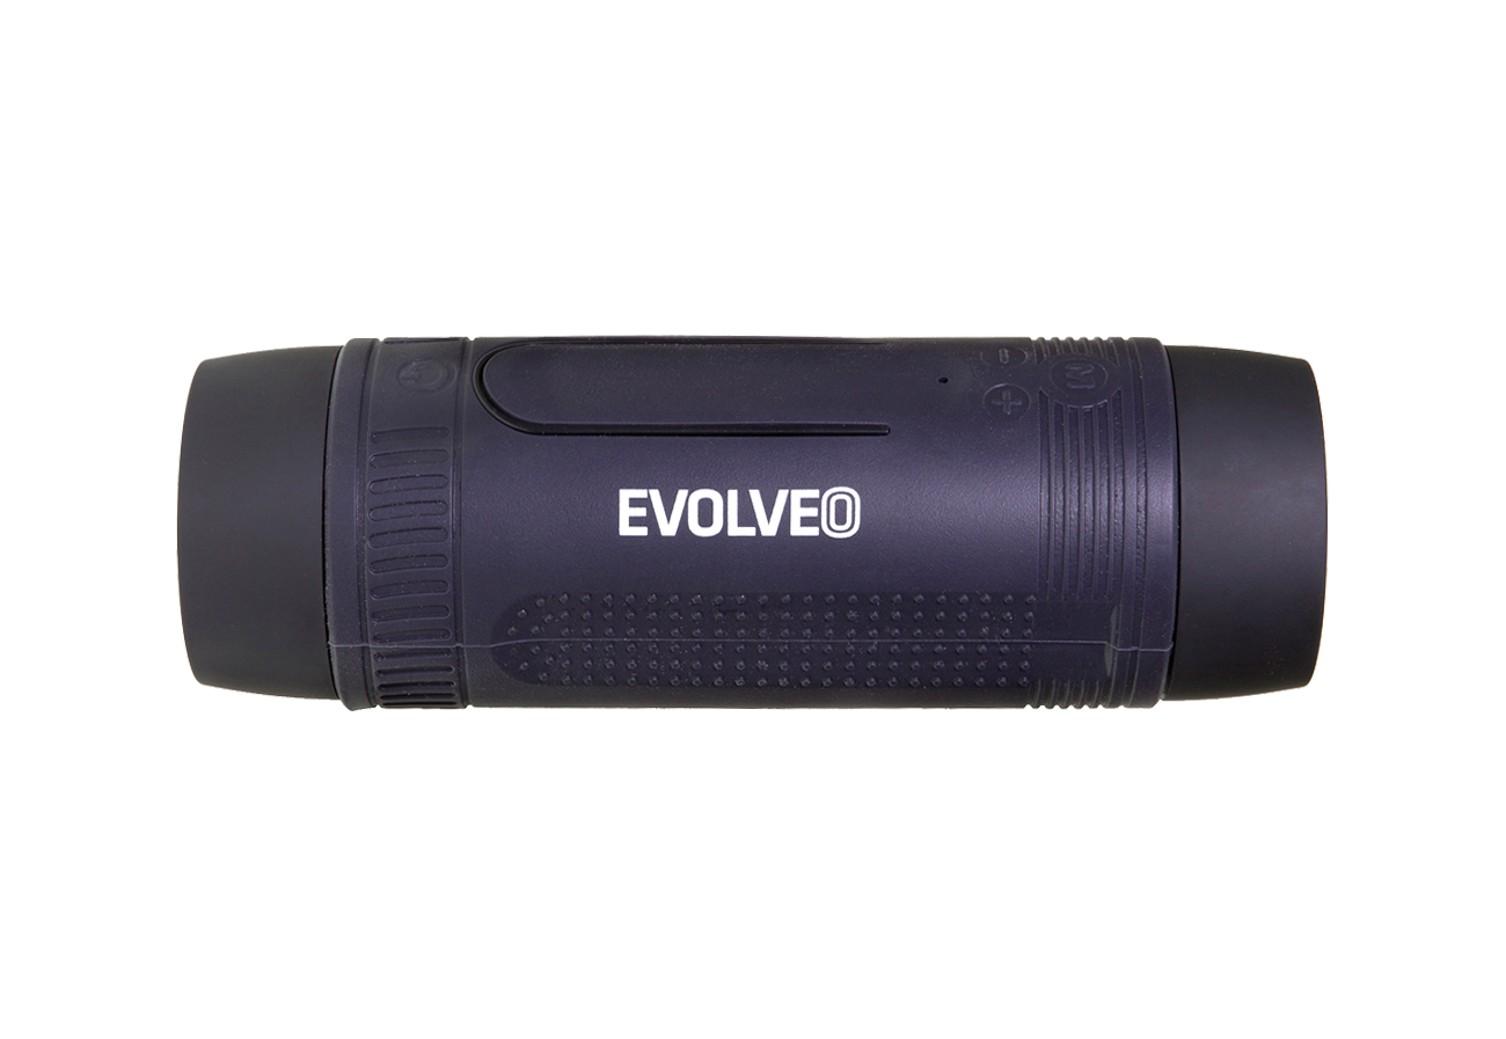 EVOLVEO Armor XL5, outdoorový Bluetooth reproduktor a MP3 přehrávač, BT4.0, LED svítilna